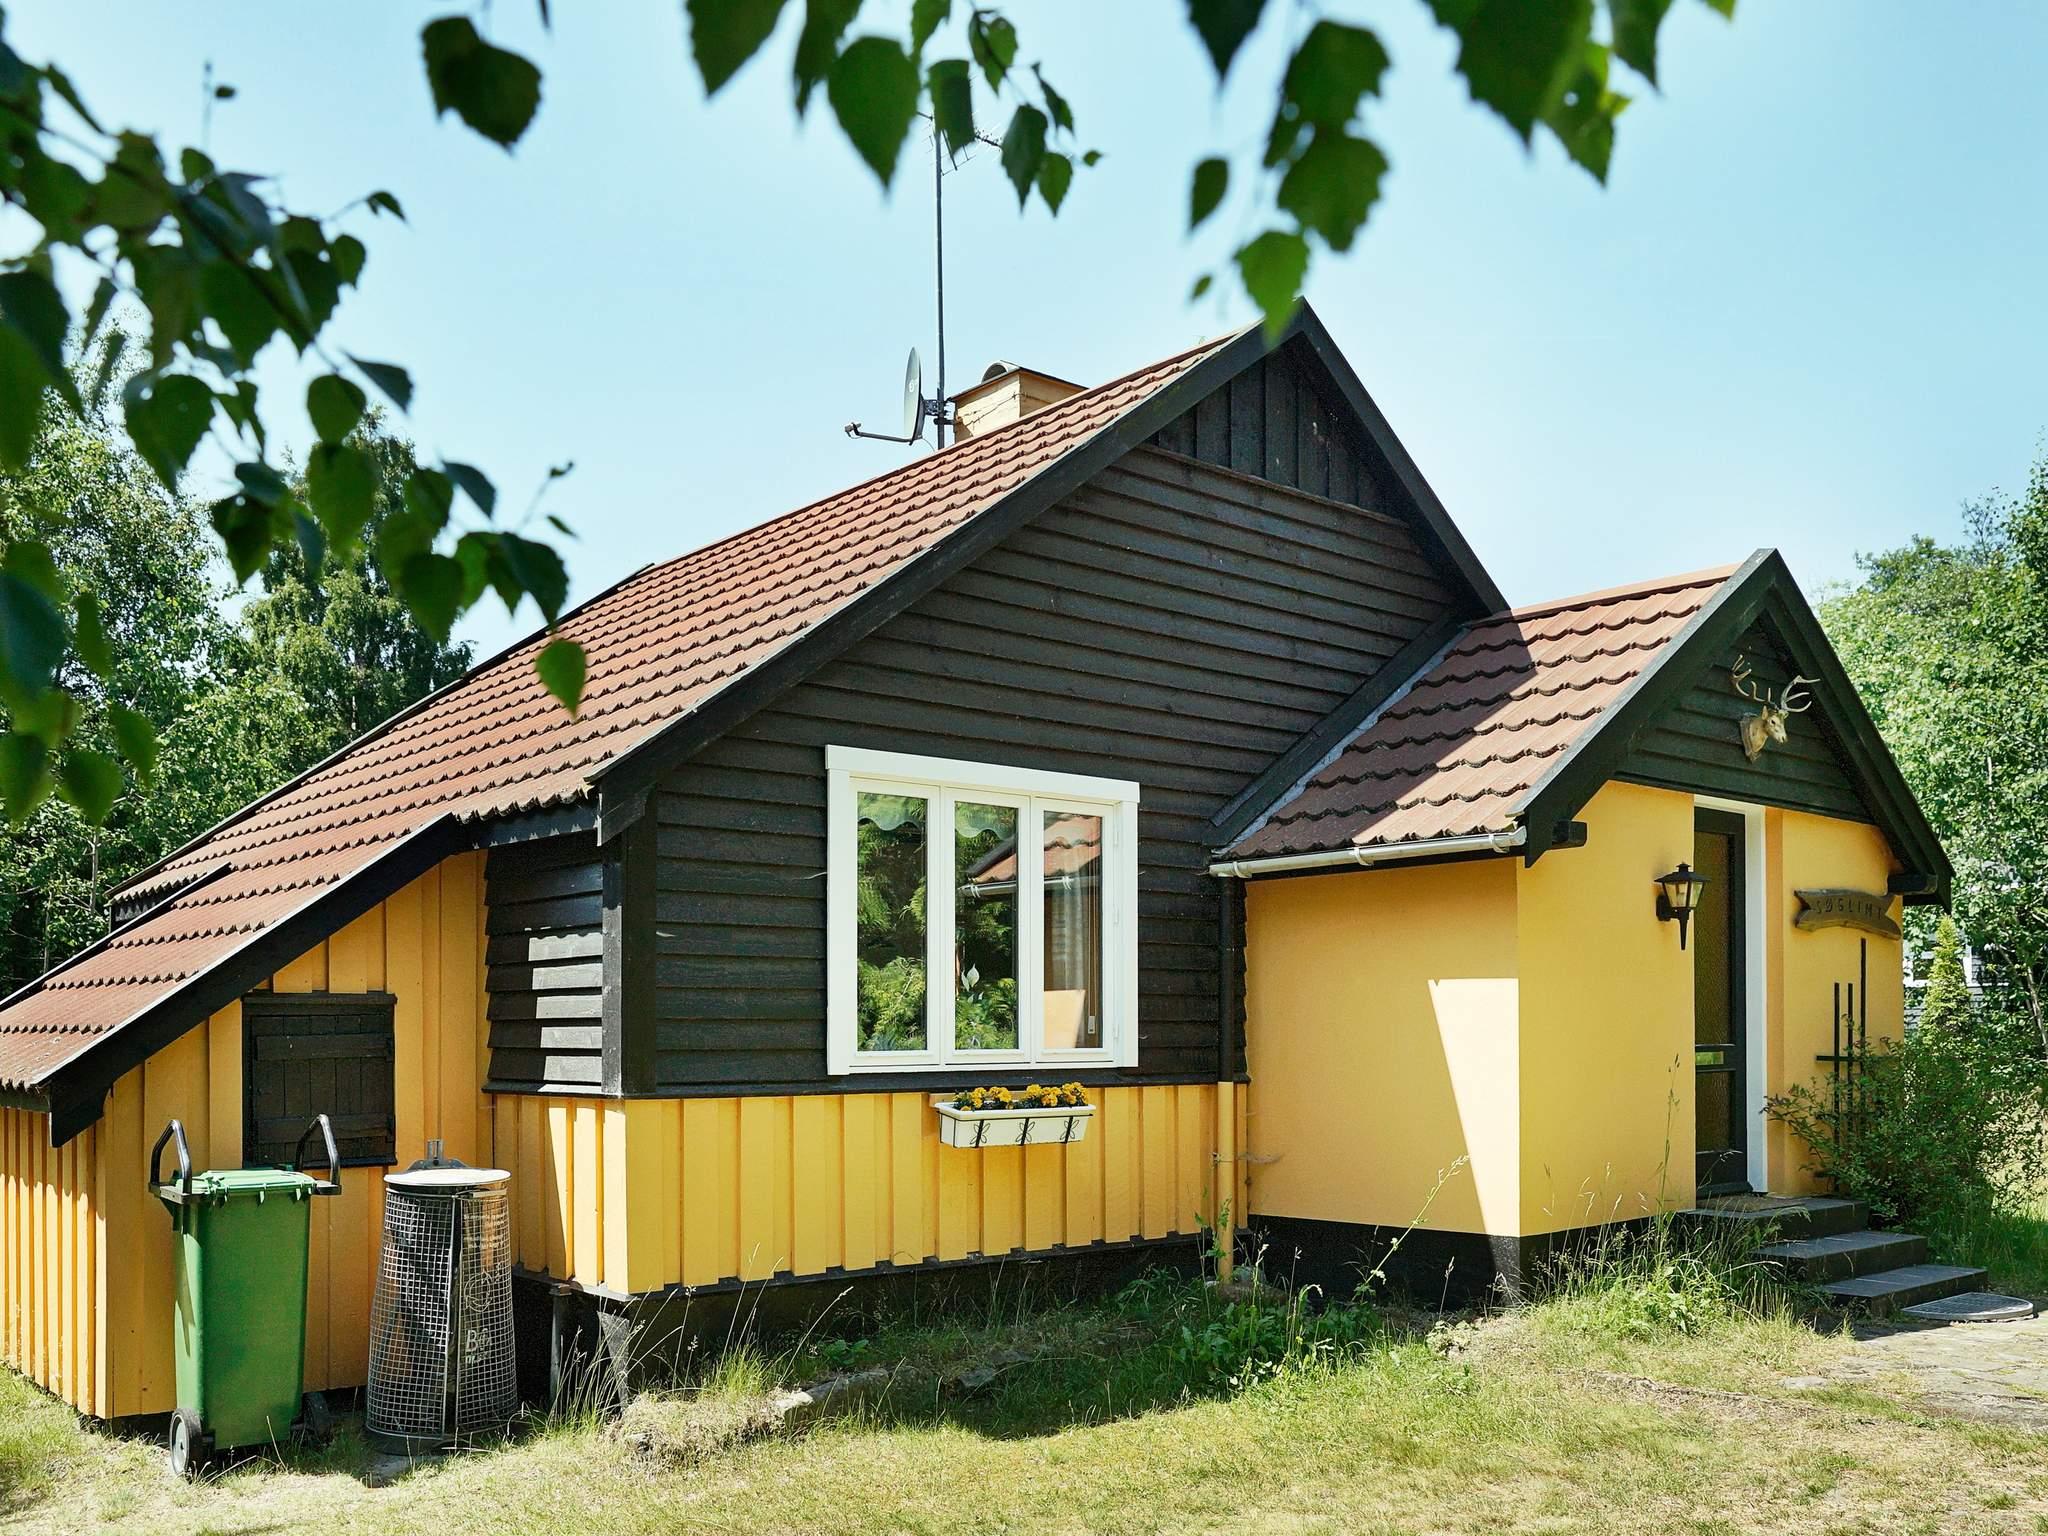 Ferienhaus Balka Strand (87019), Balke, , Bornholm, Dänemark, Bild 10